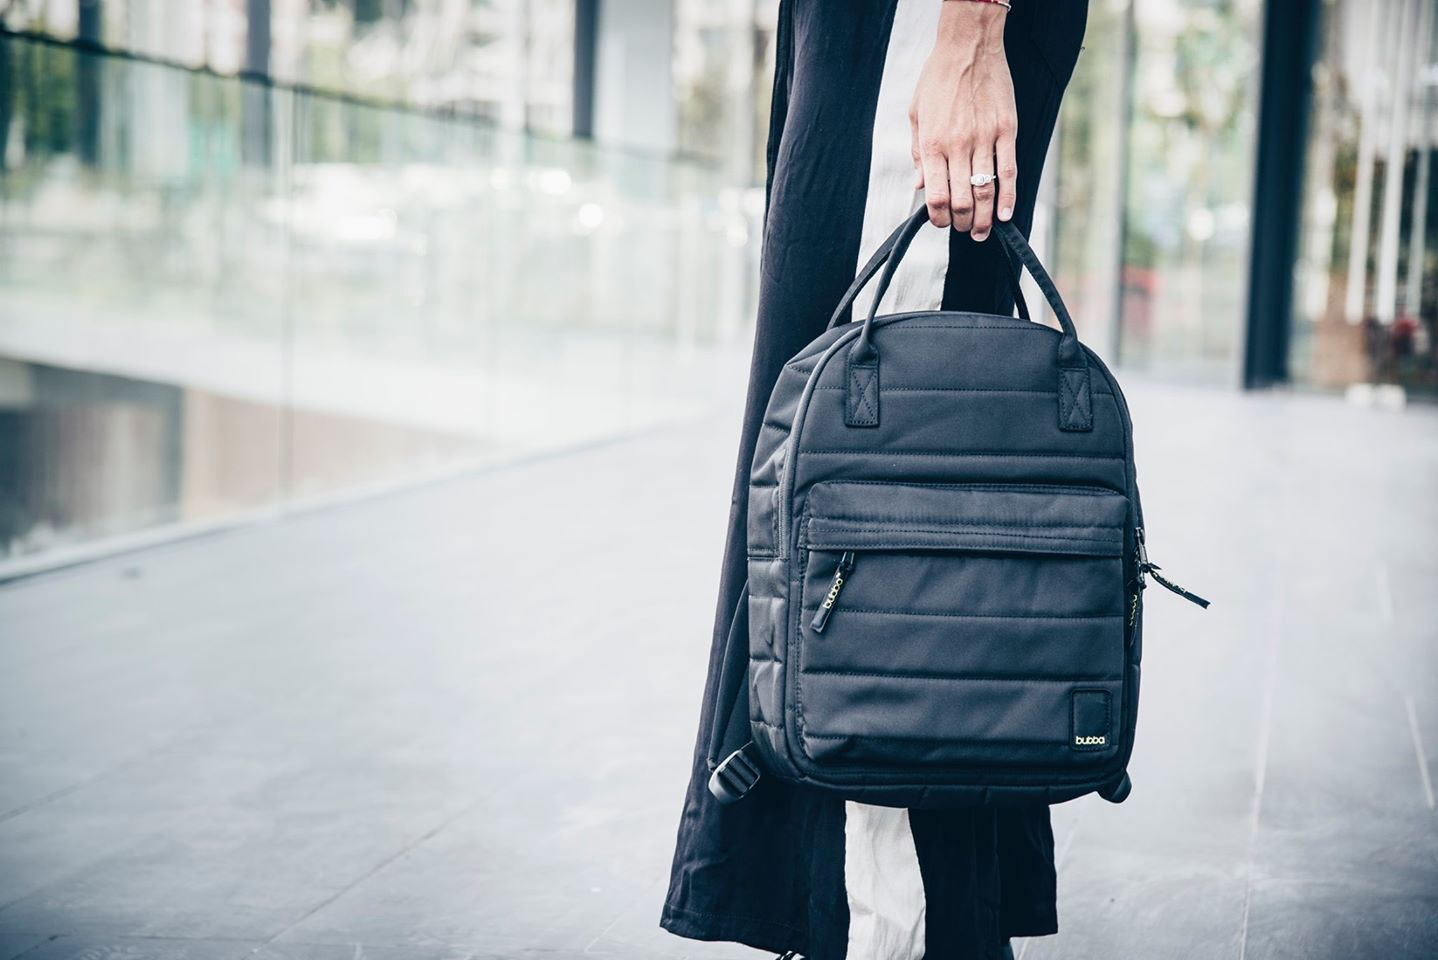 Mochila Montreal Blackhood Regular Bubba Bags